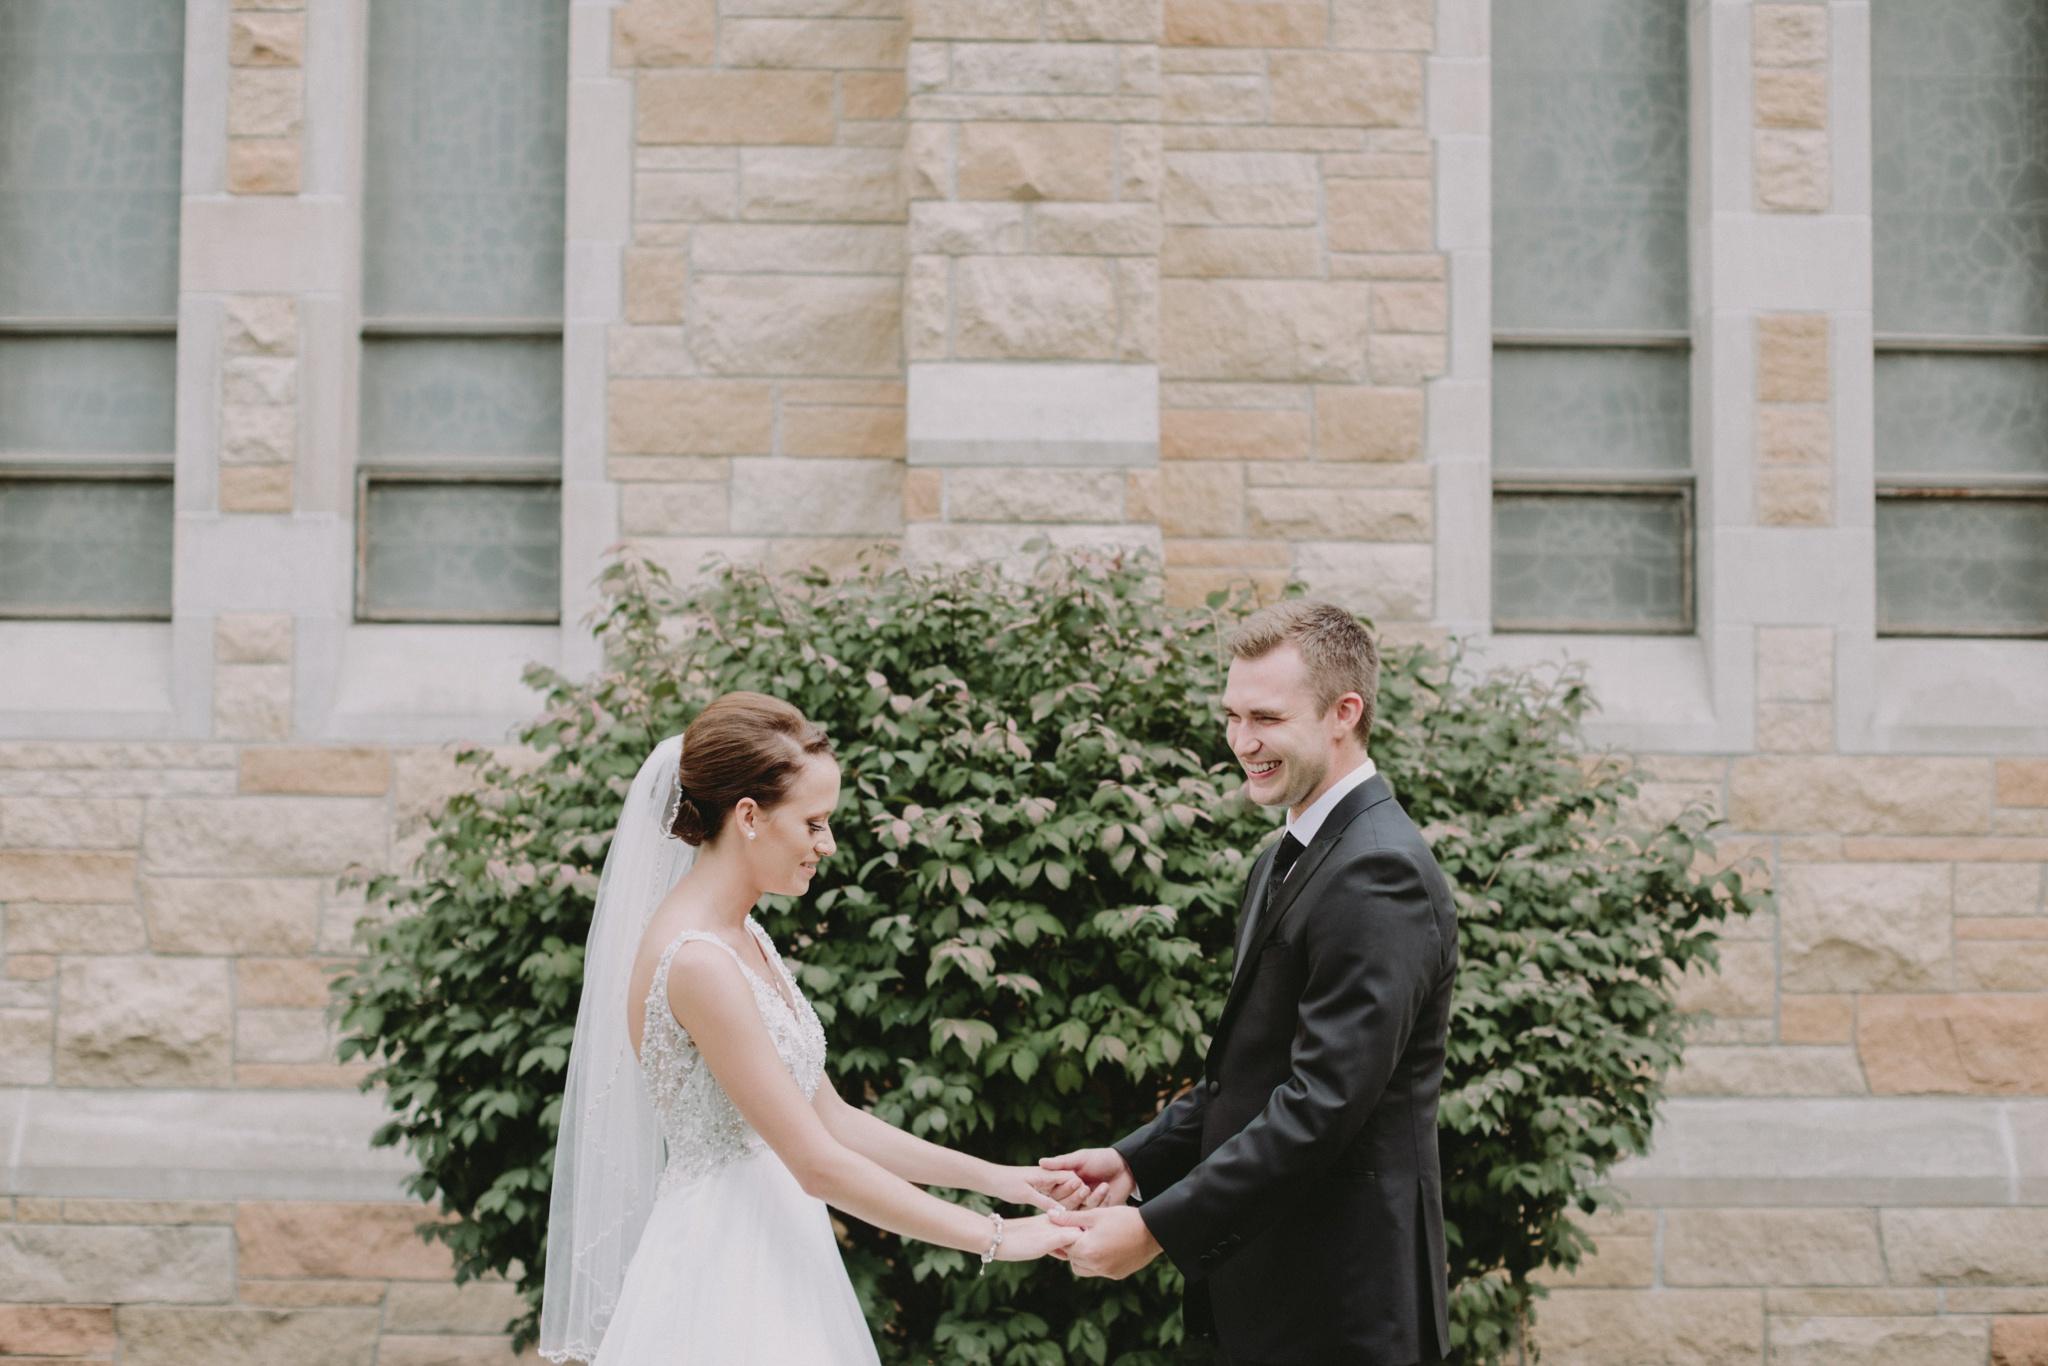 iowa-venue-fort-dodge-church-ceremony-sleeveless-dress-first-look